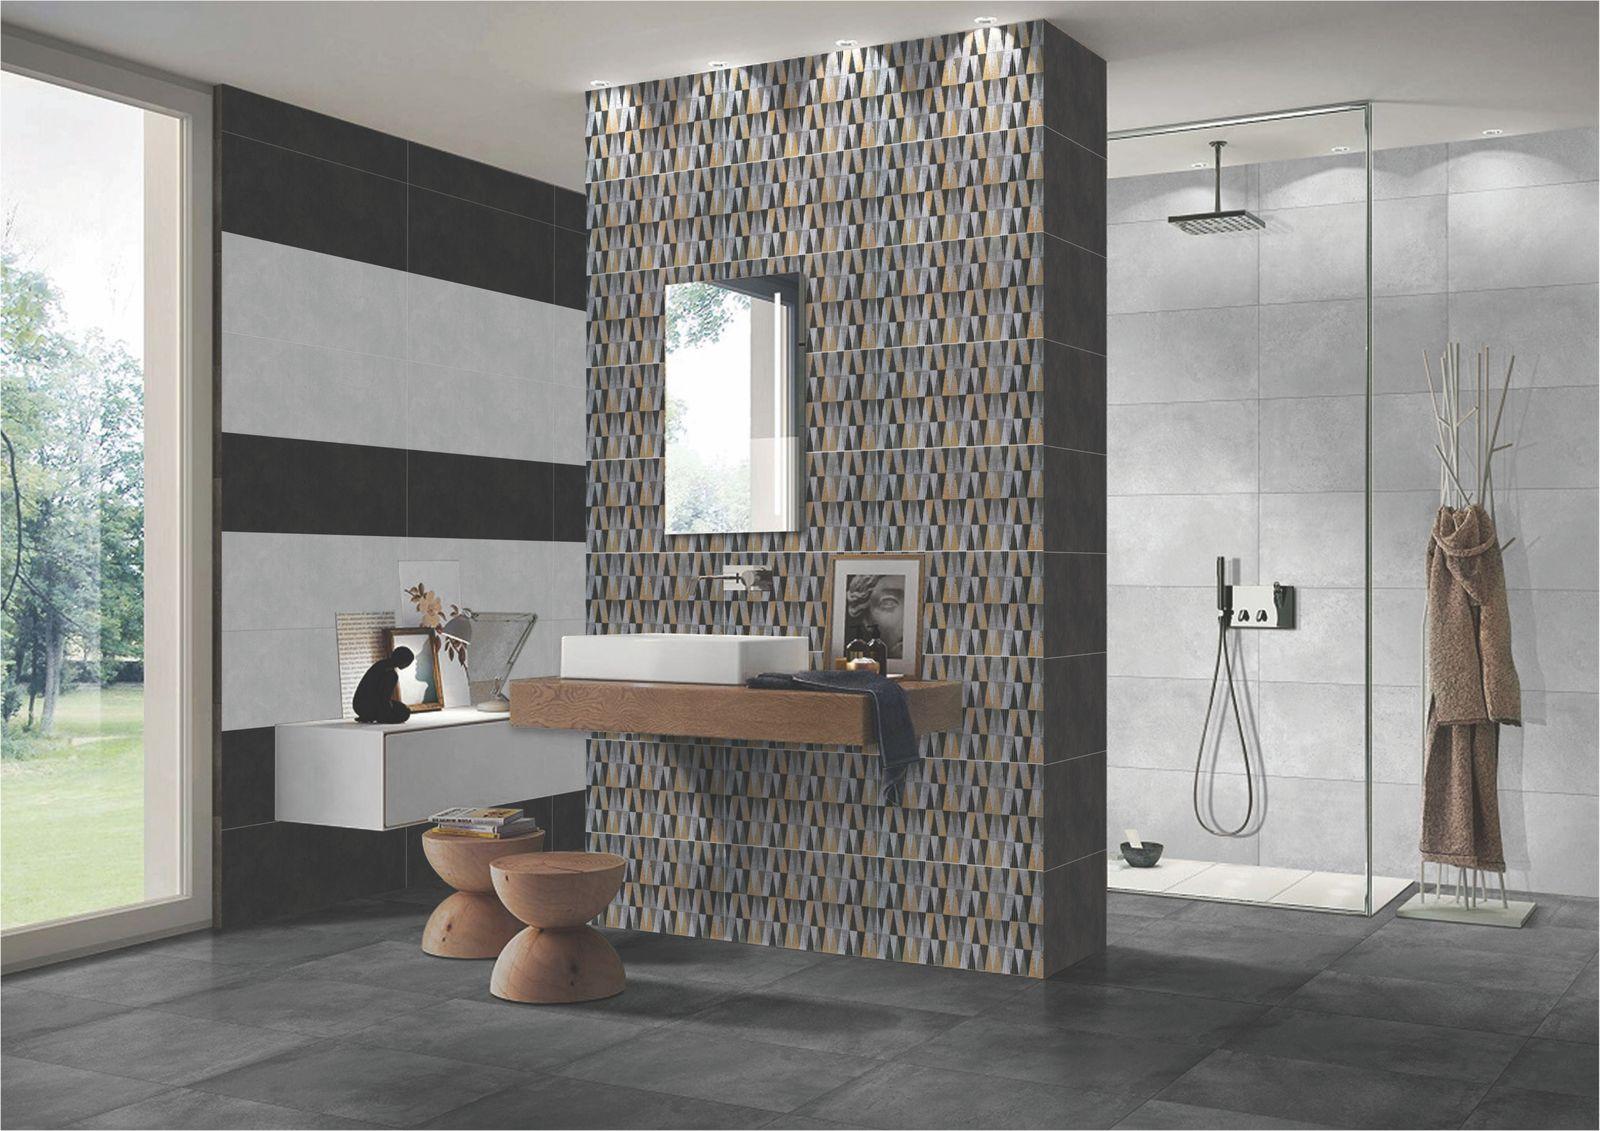 luxury el 021 30x60 cm layout result